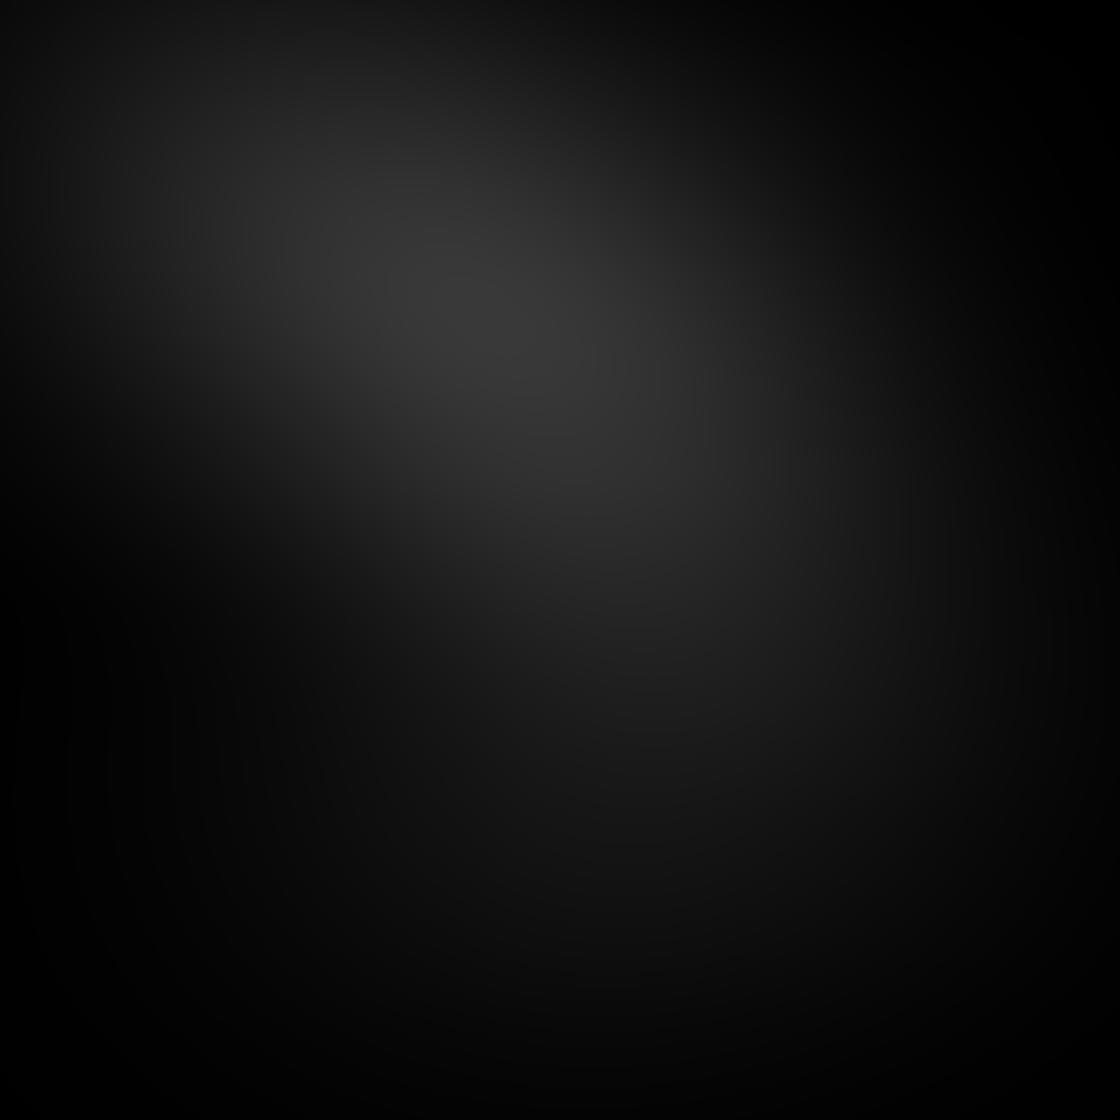 iPhone Photo Shadows 13